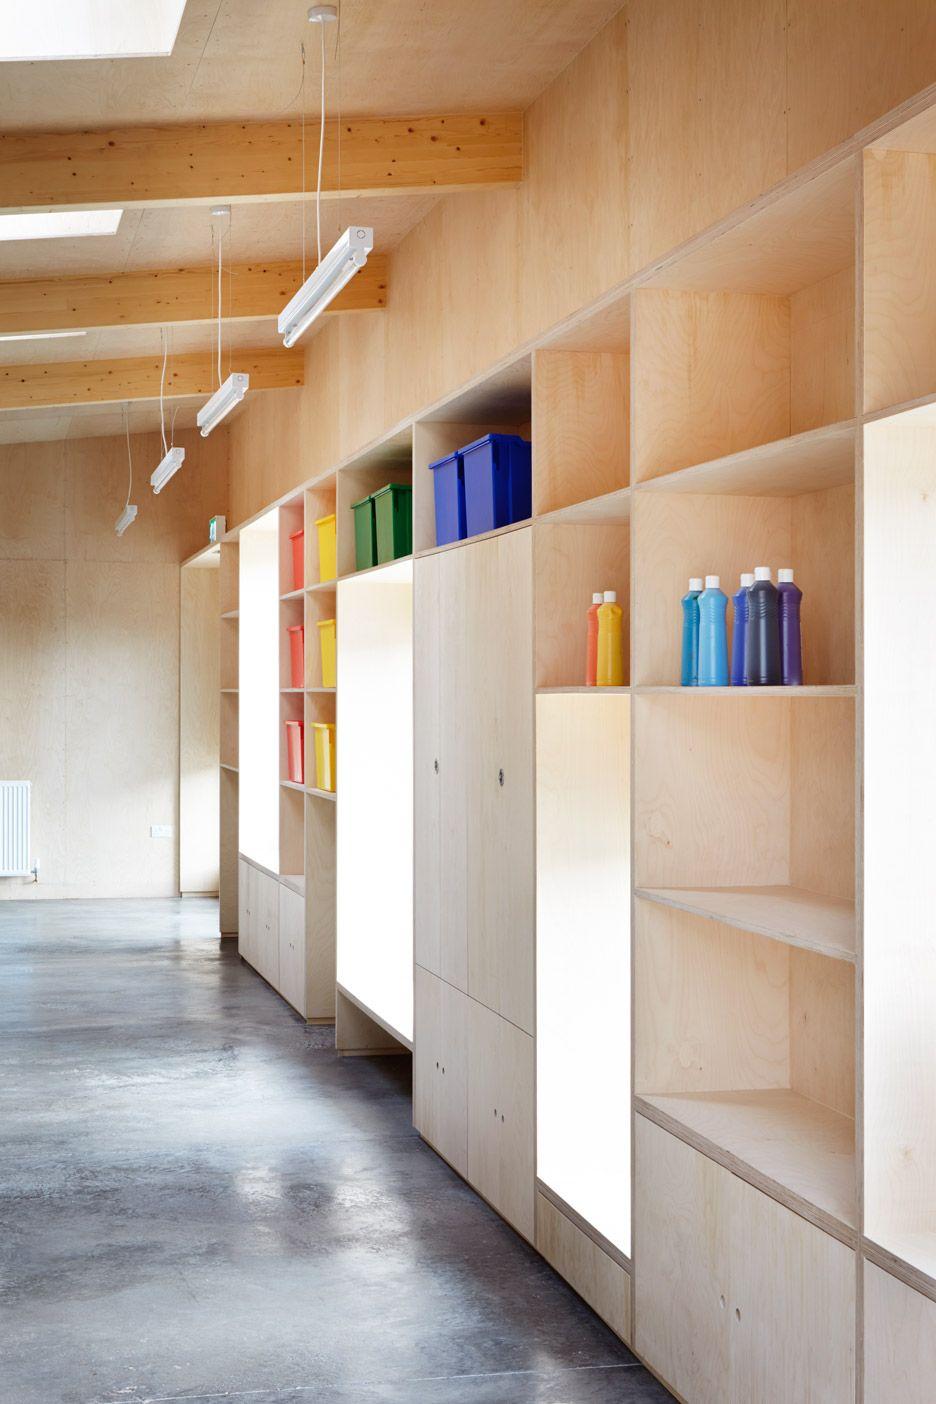 School Dining Hall Recreates Fantastic Mr Fox's Underground Interesting School Dining Room Design Decoration